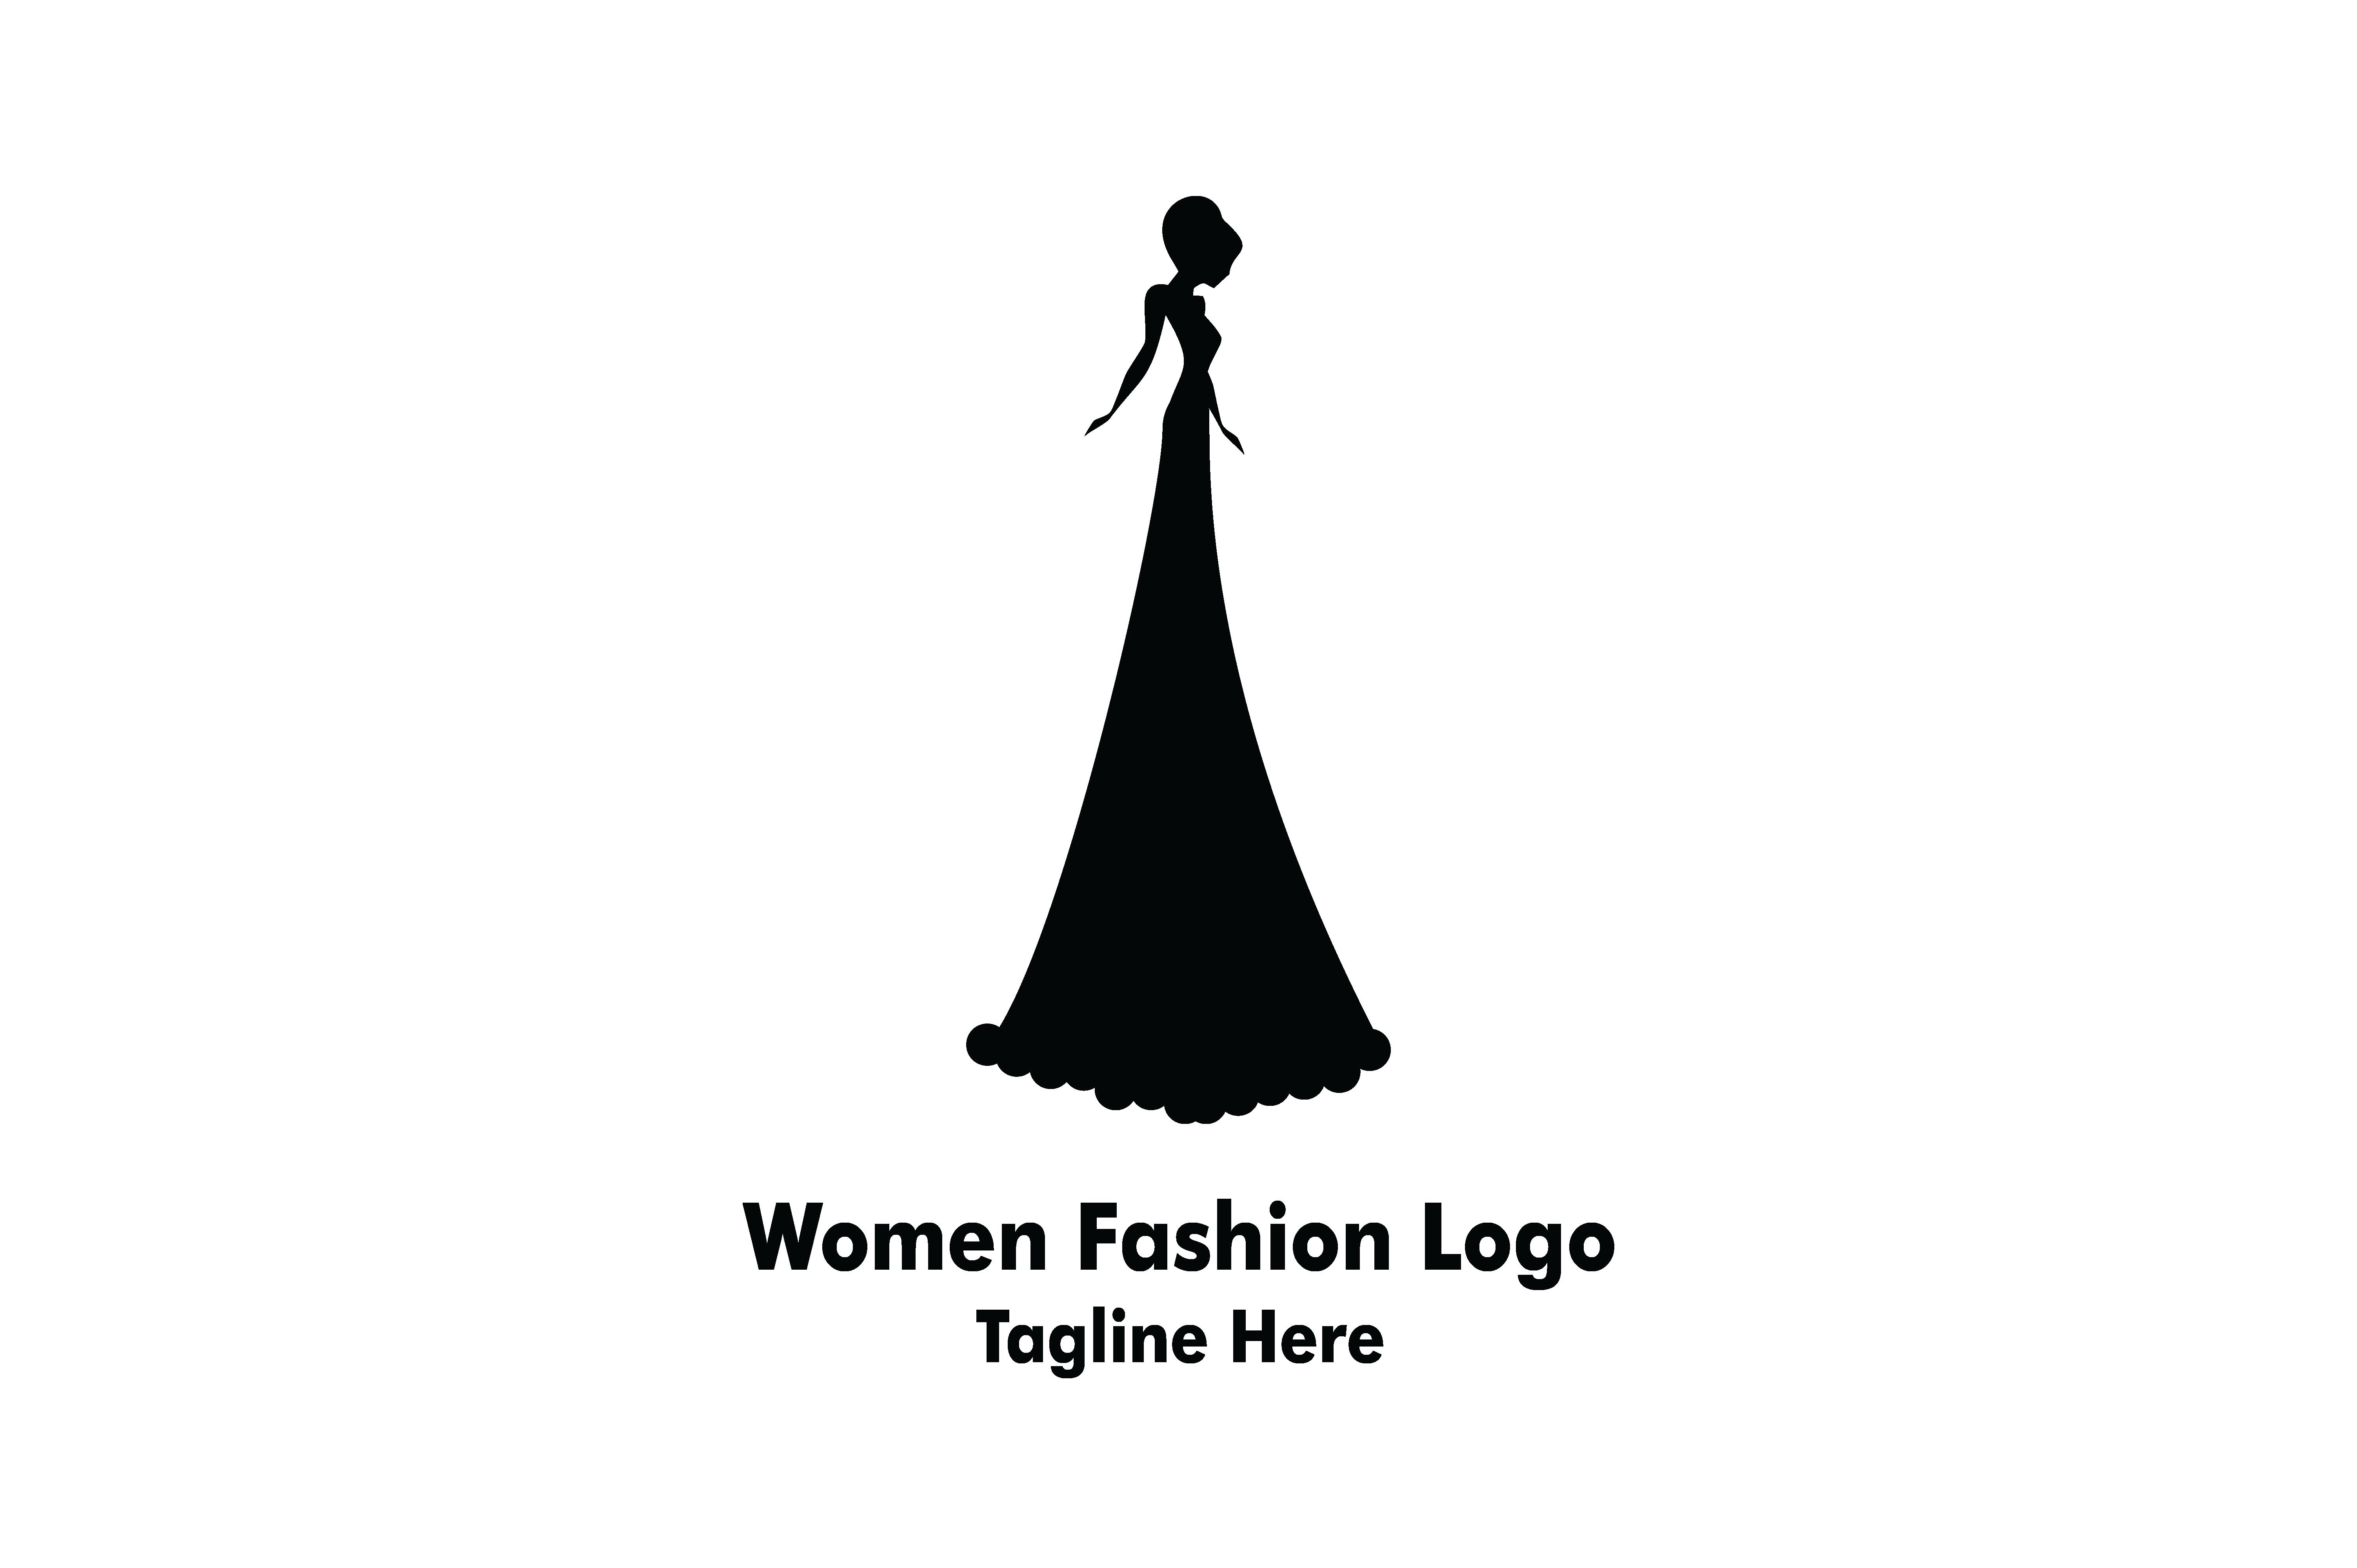 women beauty fashion logo  graphic  by yuhana purwanti